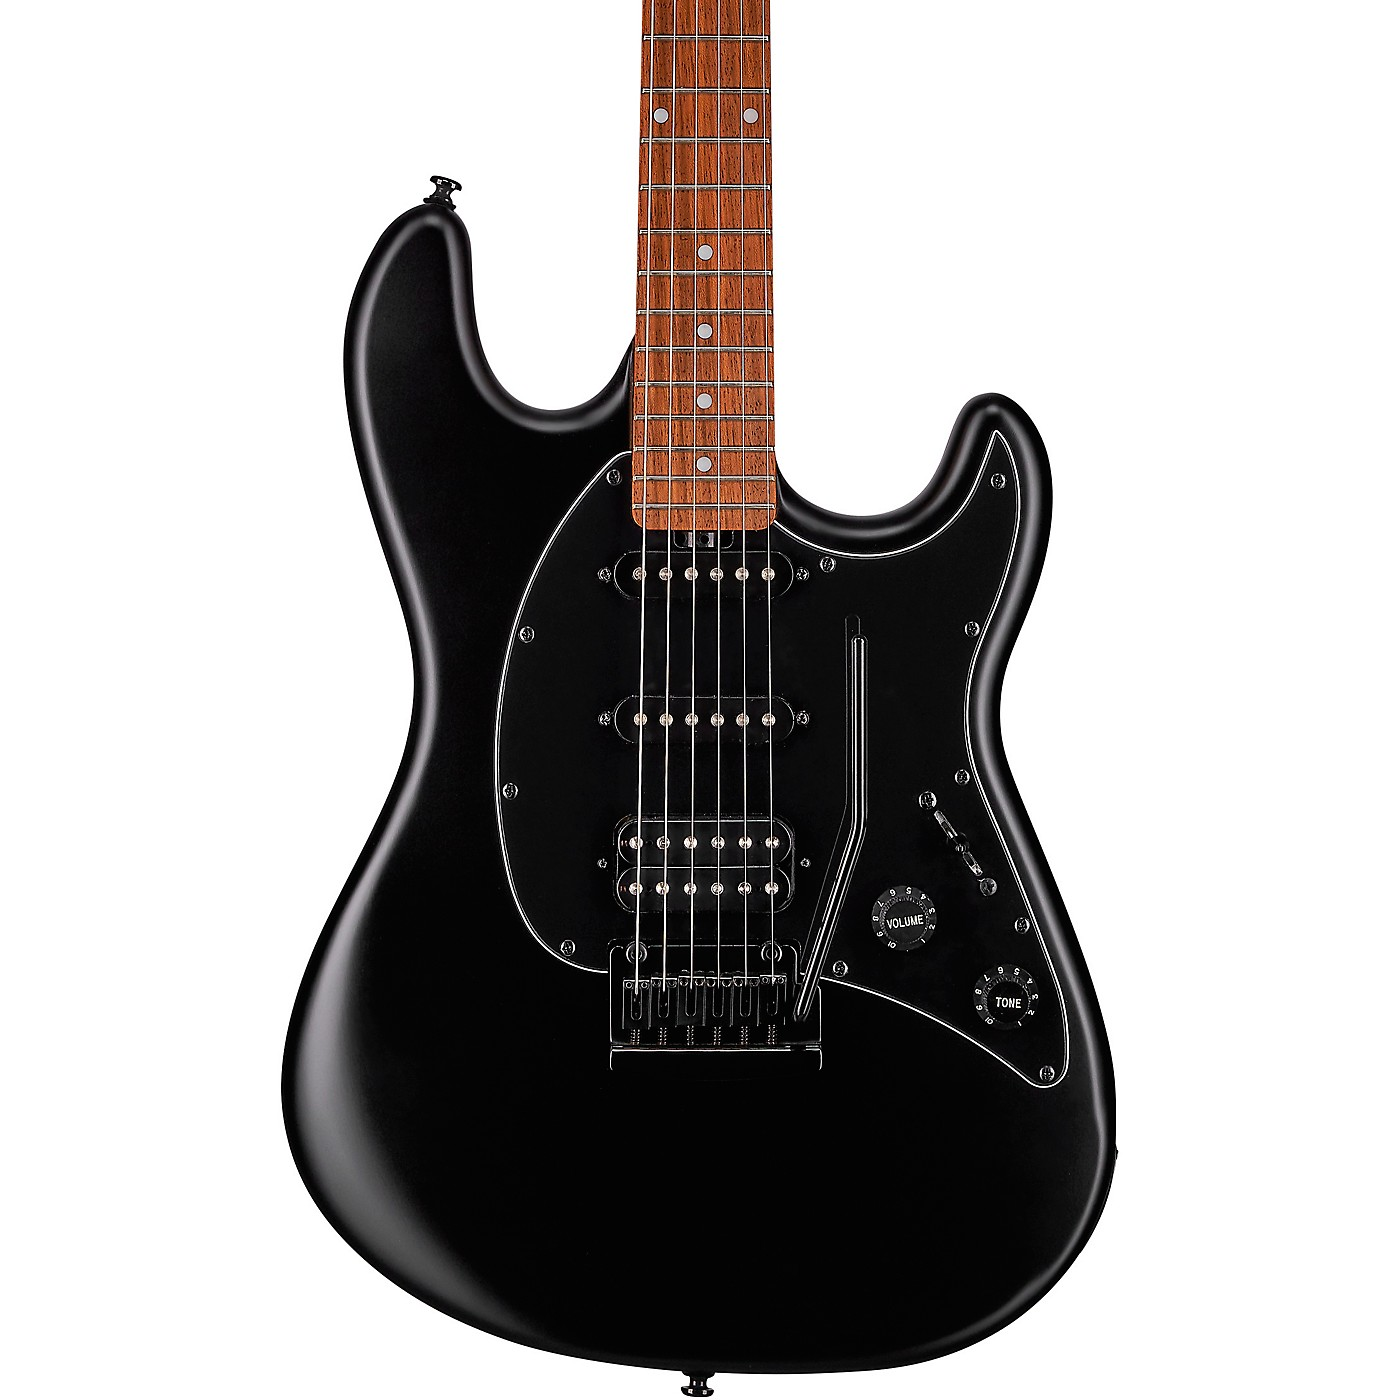 Sterling by Music Man Cutlass HSS Rosewood Fingerboard Electric Guitar thumbnail